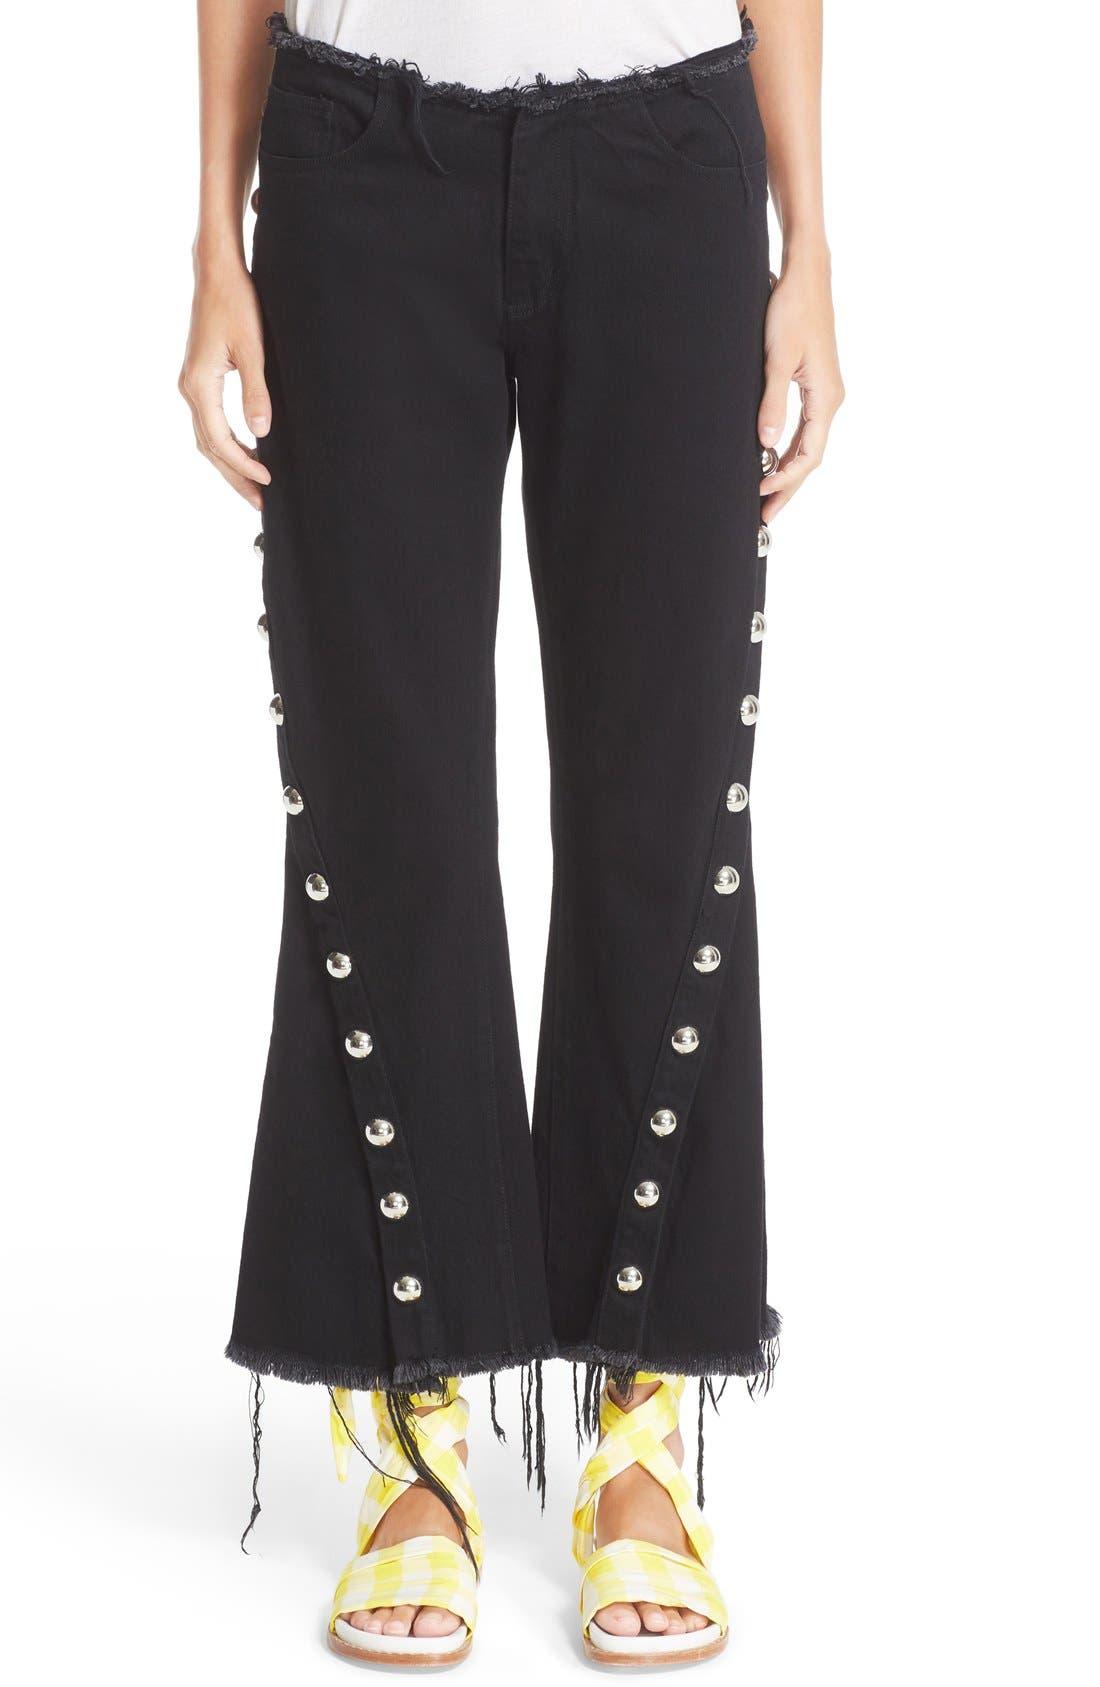 MARQUES'ALMEIDA Marques'Almeida Diagonal Button Frayed Capri Jeans